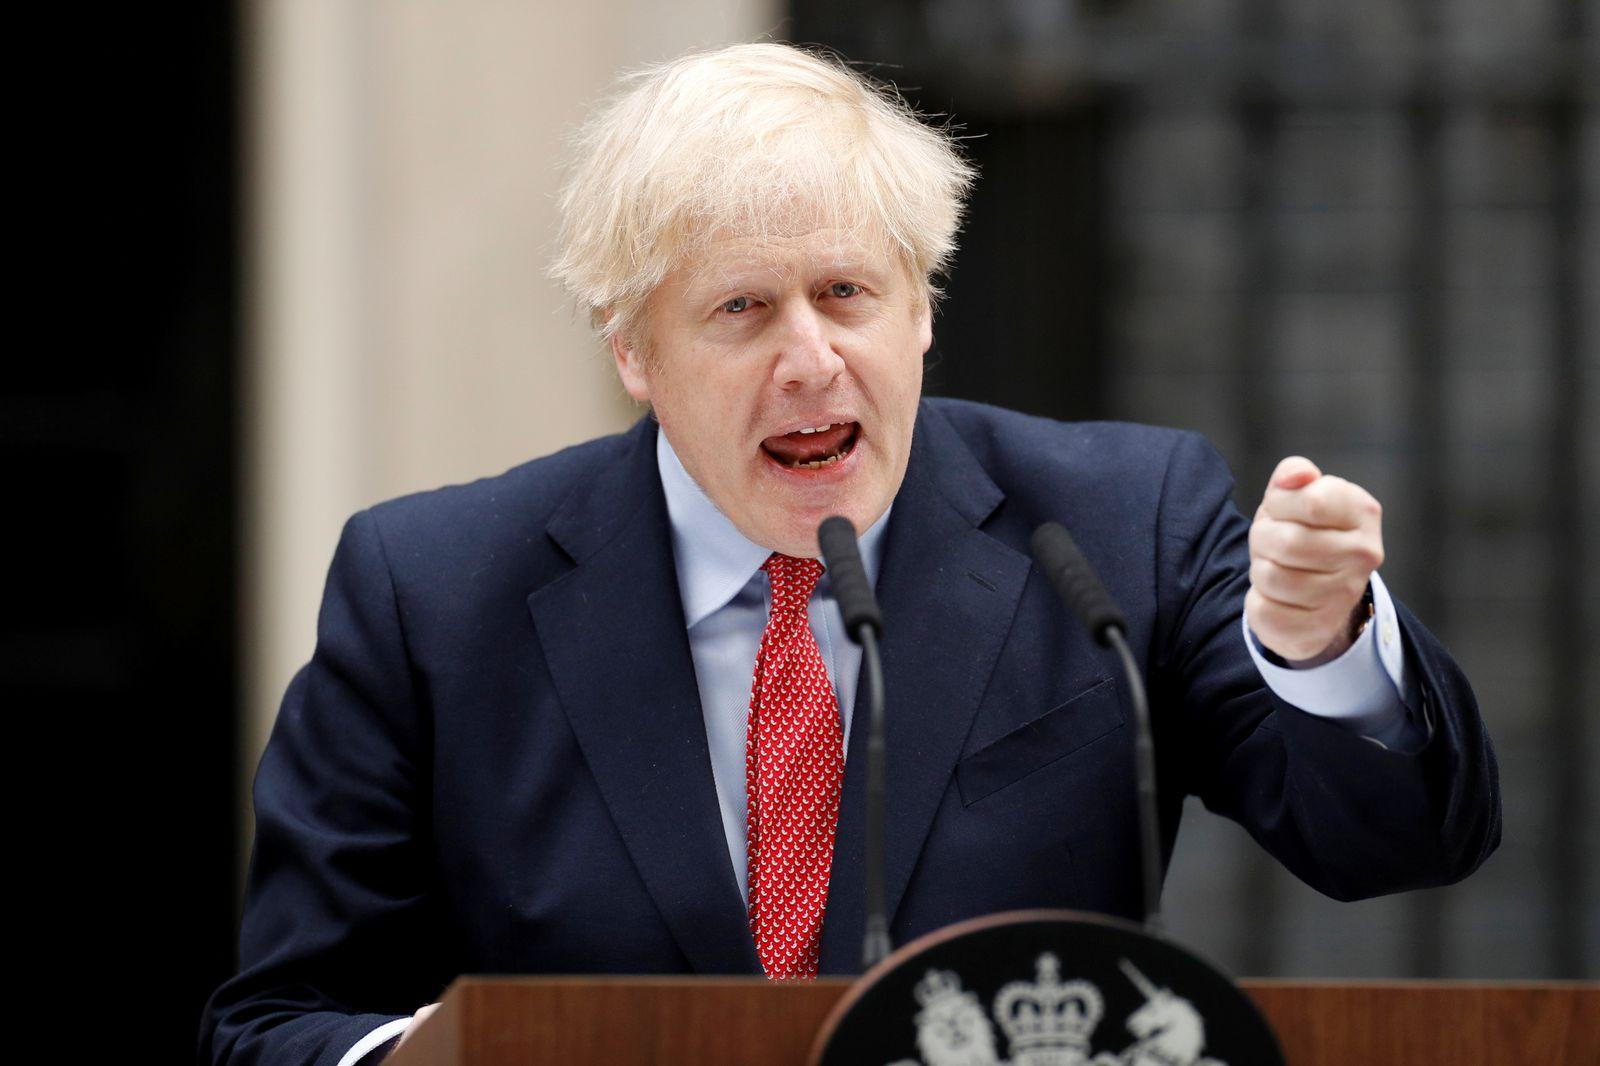 Britain's Prime Minister Boris Johnson to return to work on Monday